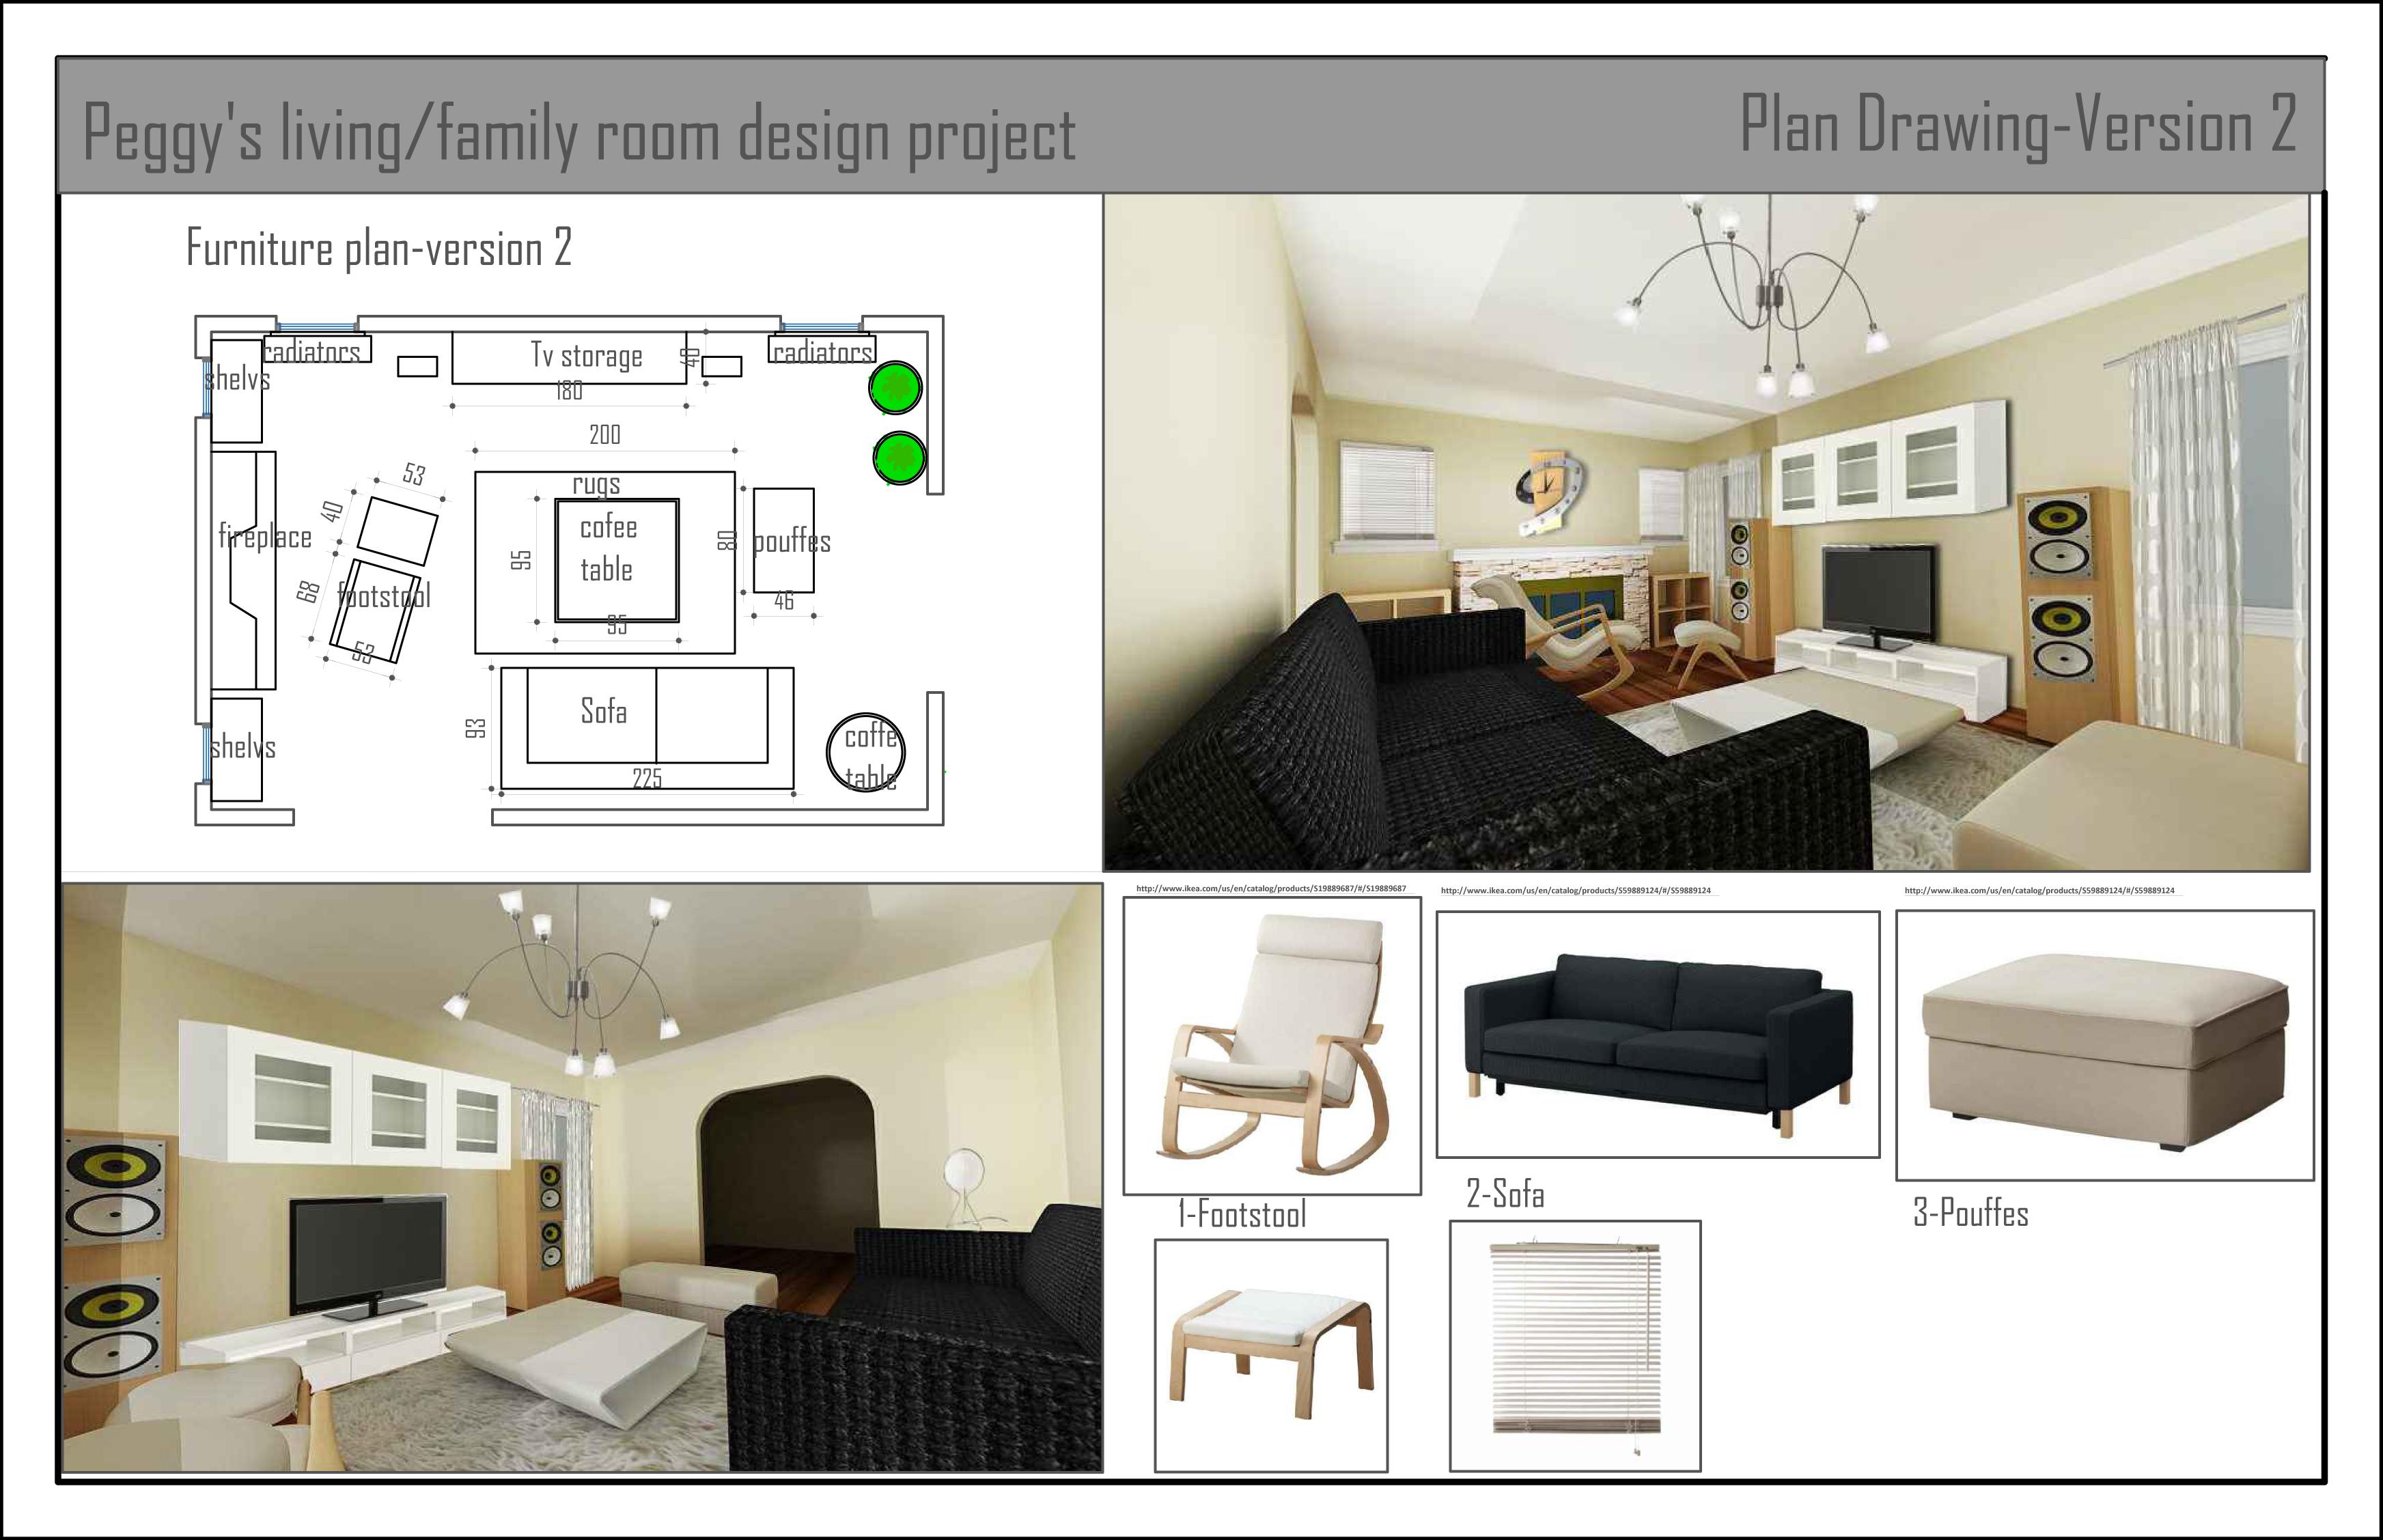 ... Cromwell, Connecticut, United States Interior / Home Interior Design